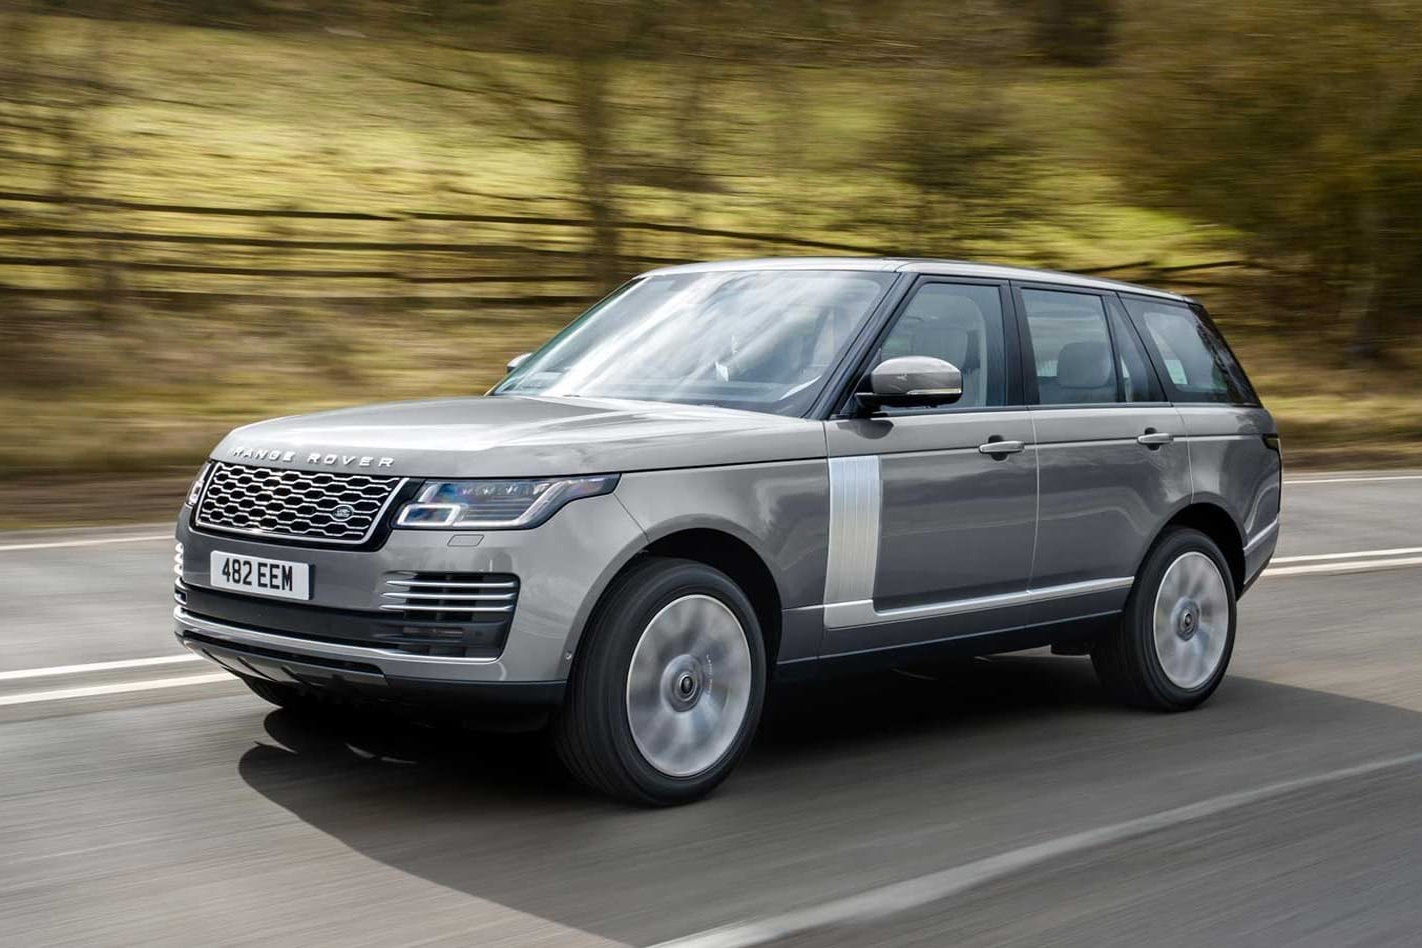 2020 Range Rover debuts Ingenium straight-six